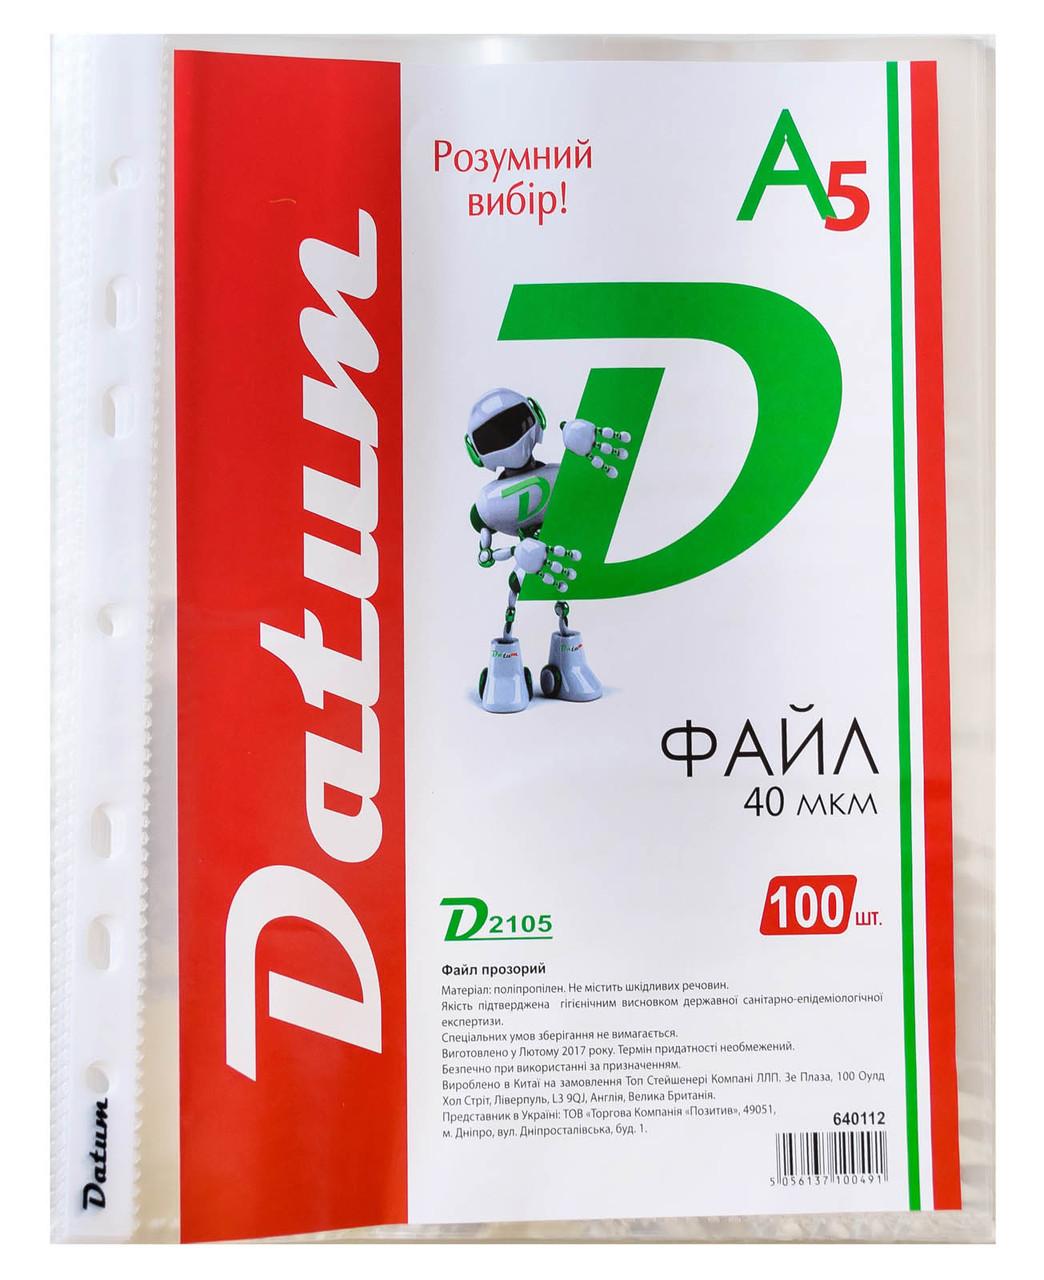 Файл A5 40 мкм D2105 100шт